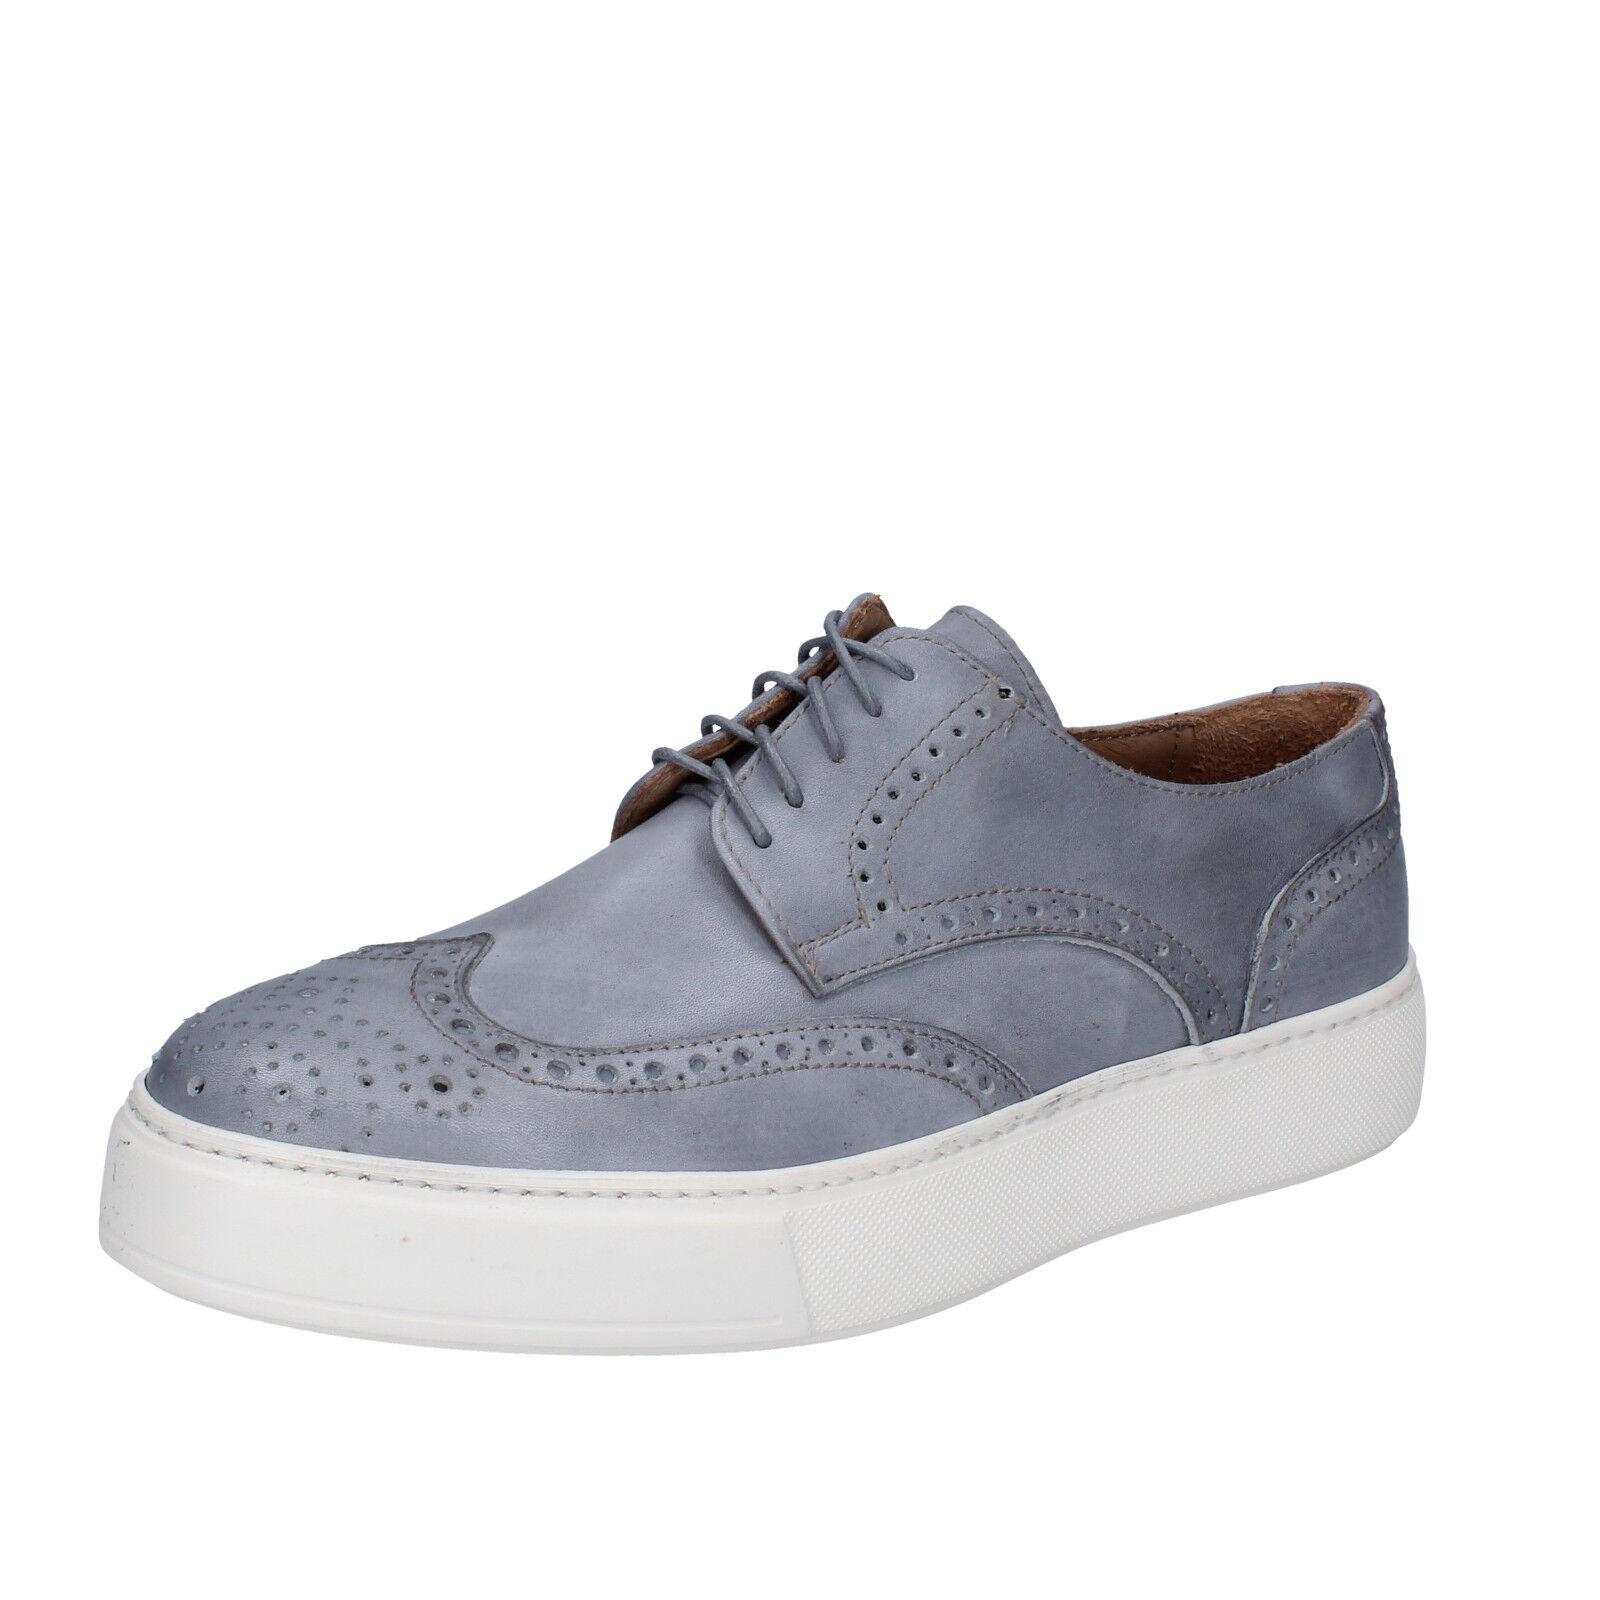 da da da Uomo Di Mella 40 UE Elegante scarpe da ginnastica grigio in pelle ab931-b 4e81c0